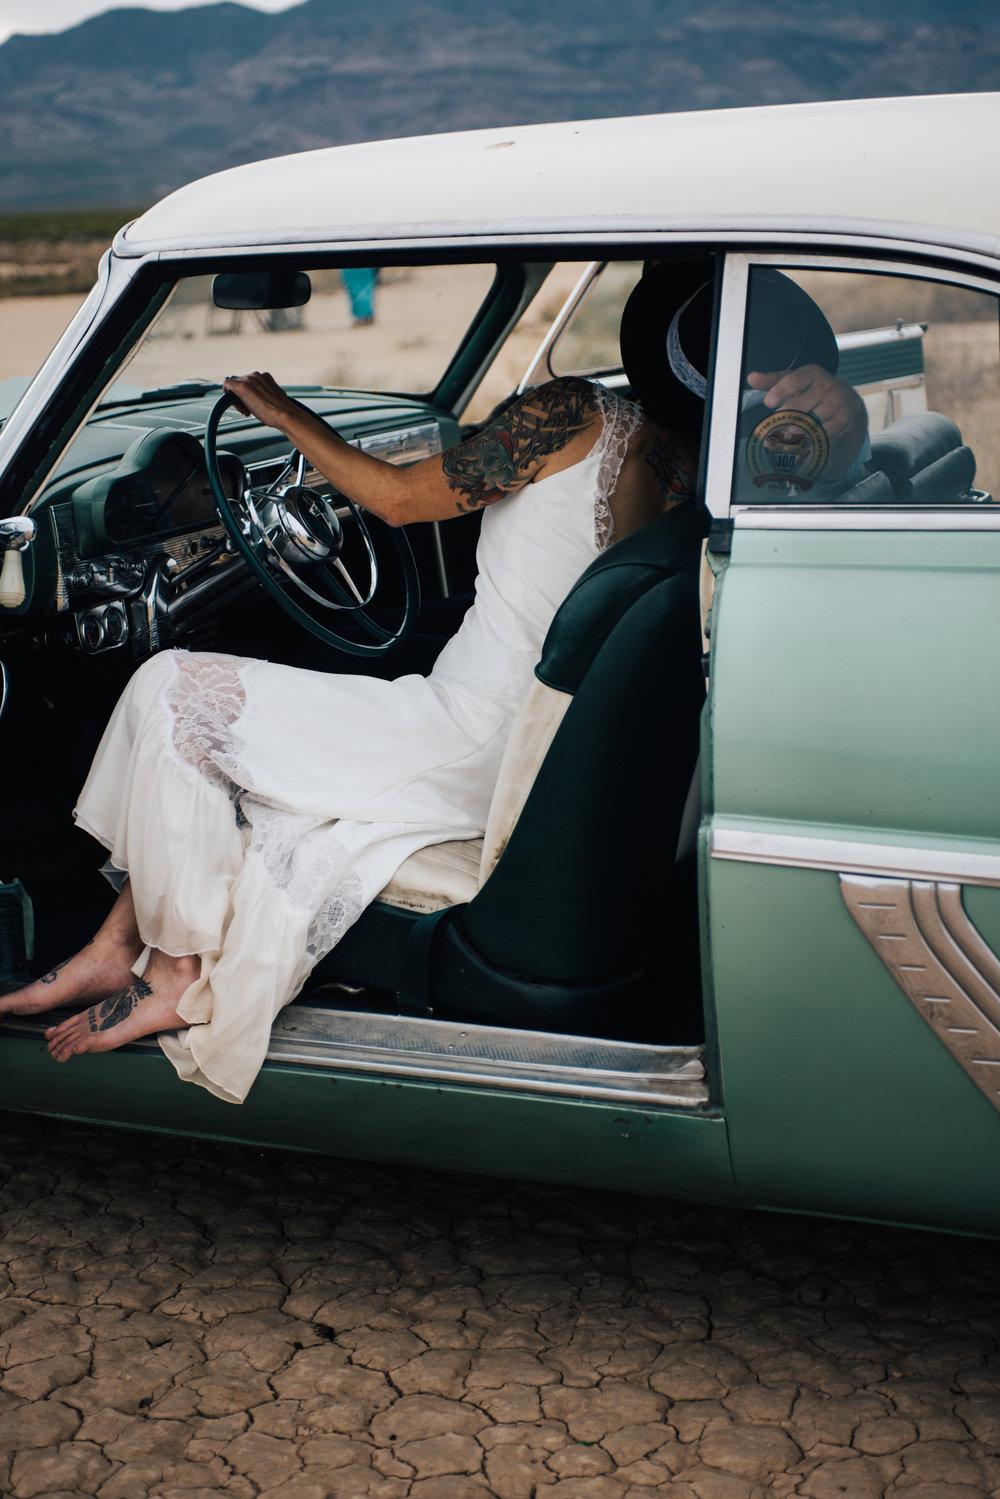 rock'n roll bride, las vegas elopement, bride and groom, tattoo bride, las vegas wedding, lifestyle photography, lifestyle wedding, desert elopement, las vegas, elopement, wedding, las vegas downtown wedding, alternative bride, off beat bride